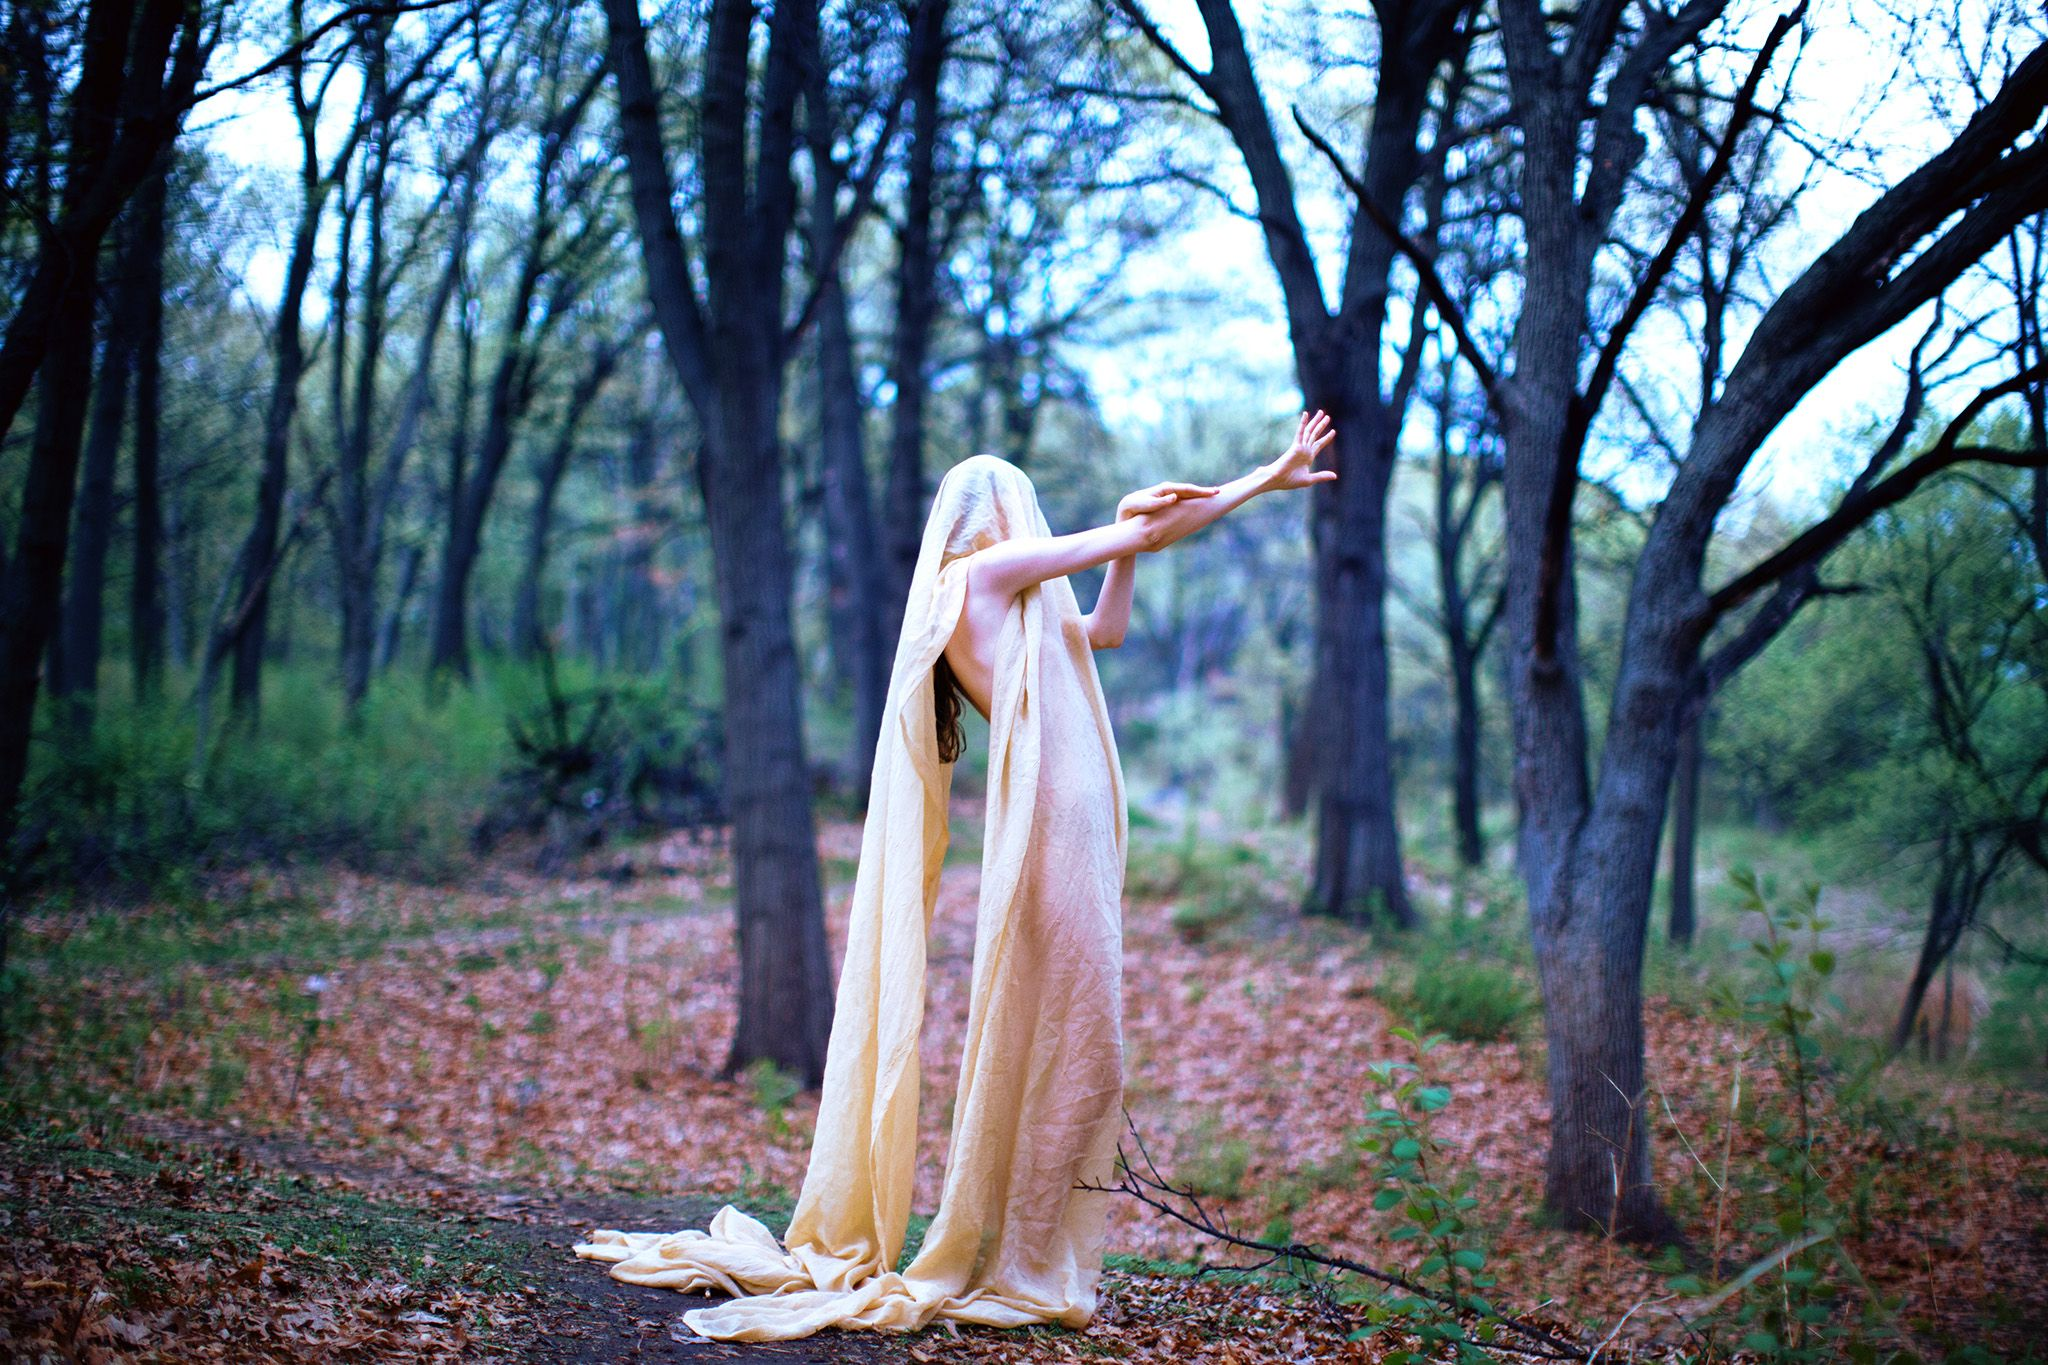 Мистика в фотографиях Lauren Wuornos